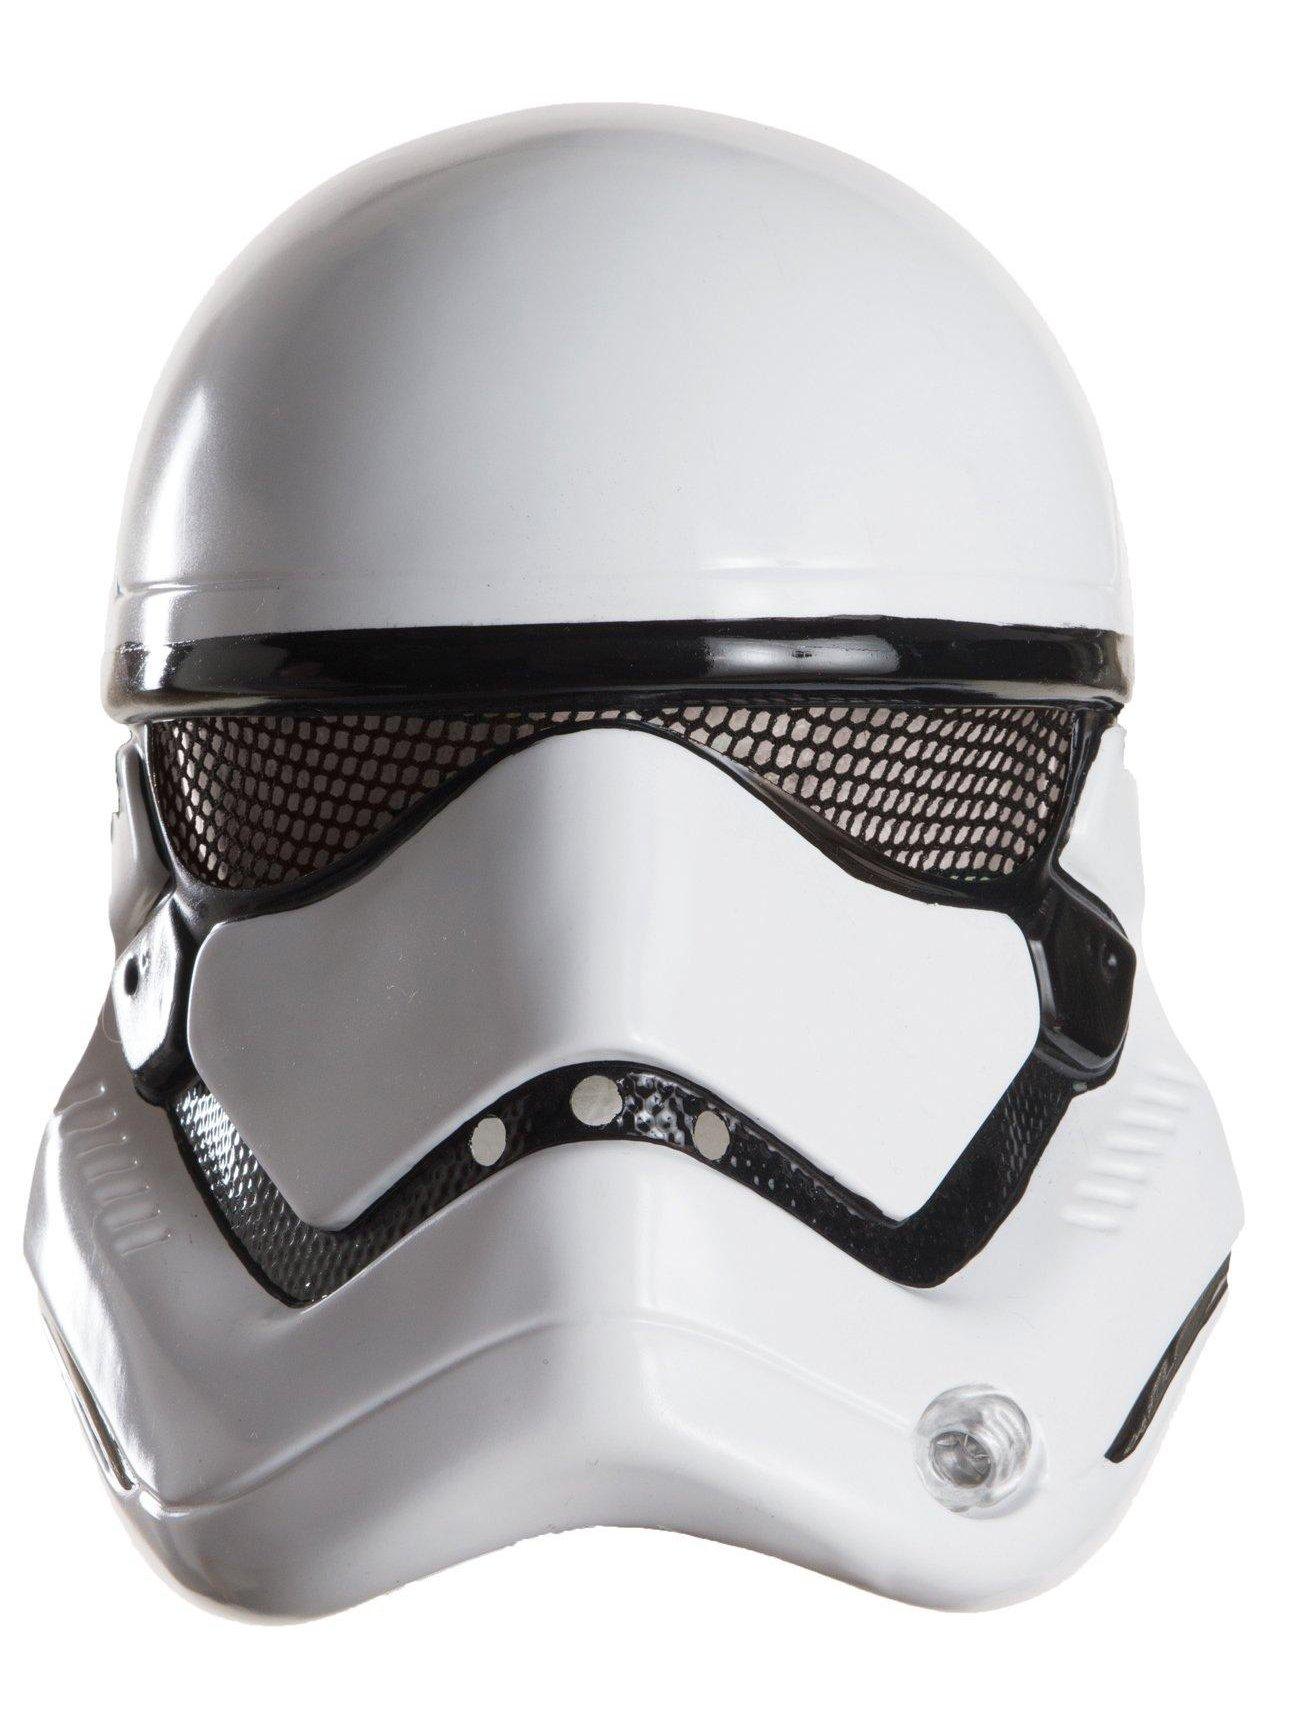 Rubie's Star Wars: The Force Awakens Child's Stormtrooper Half Helmet